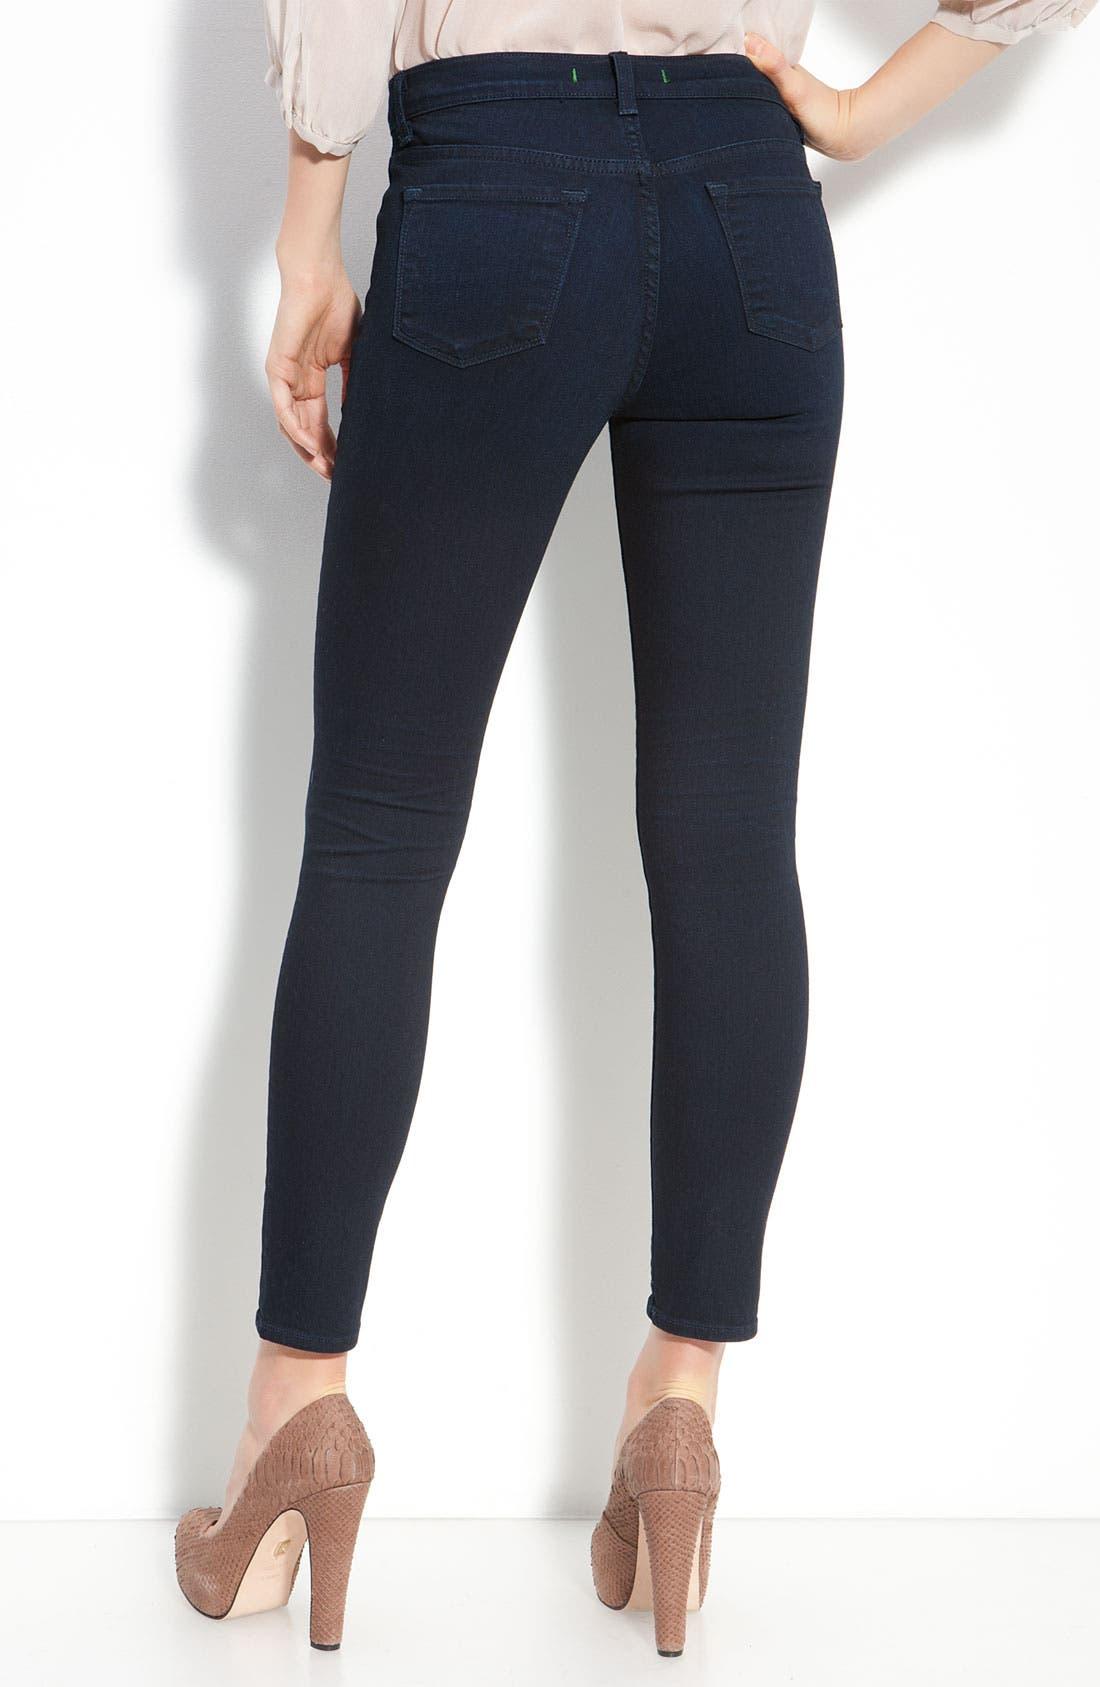 Main Image - J Brand 'Maria' Ankle Jeans (Dynamite Wash)